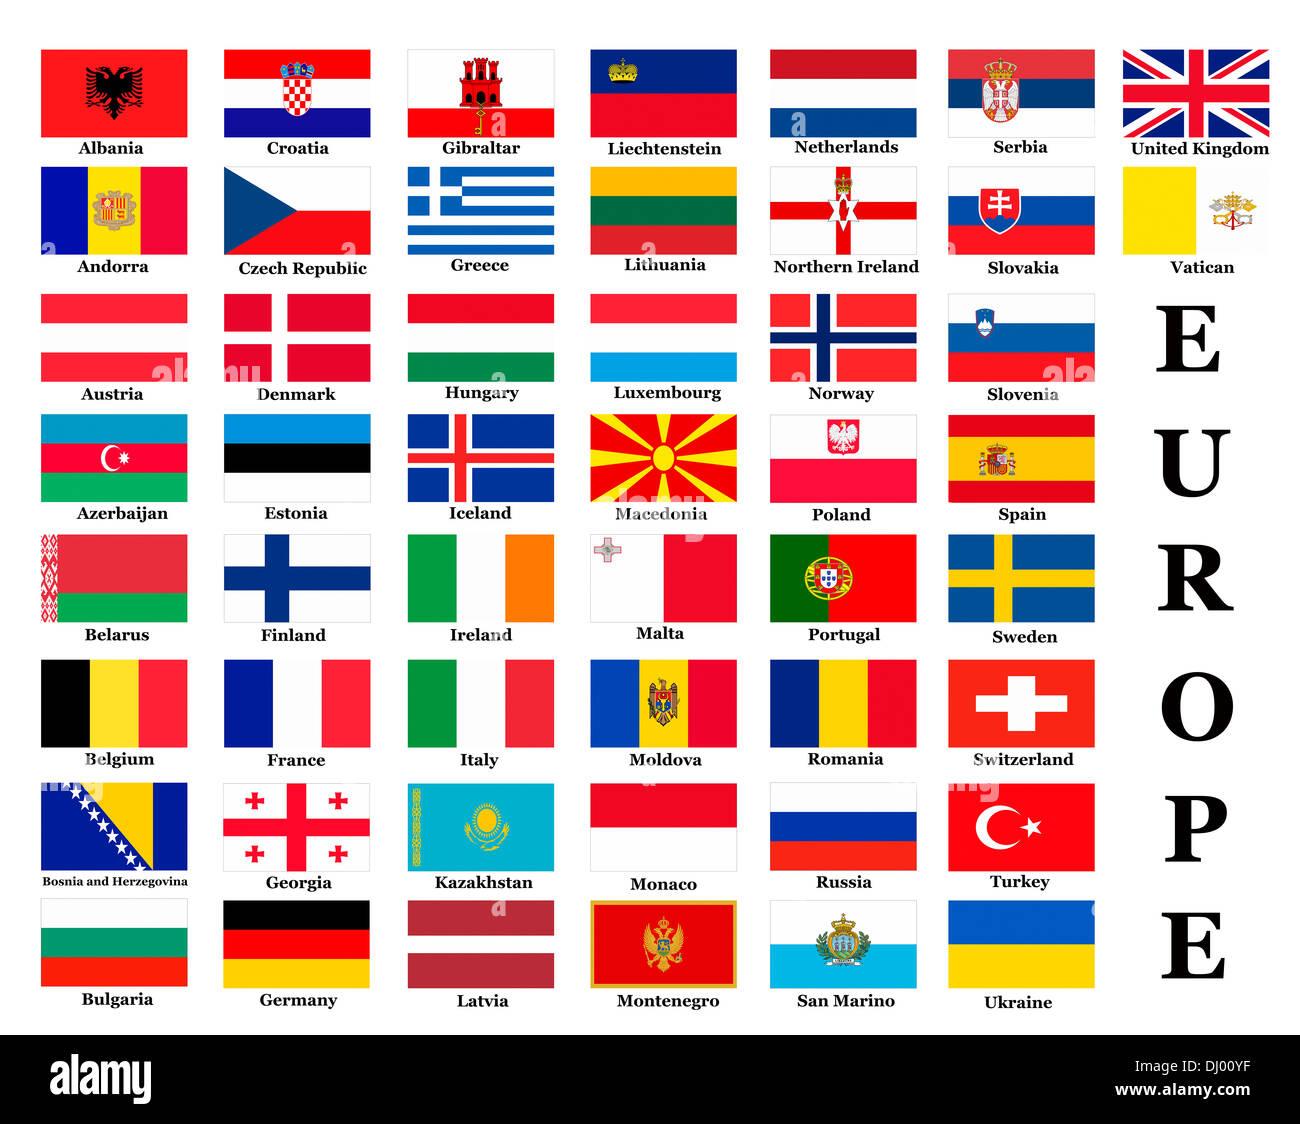 Nations of Europe Flag Flags T Shirt Albania Andorra Belarus Belgium Austria